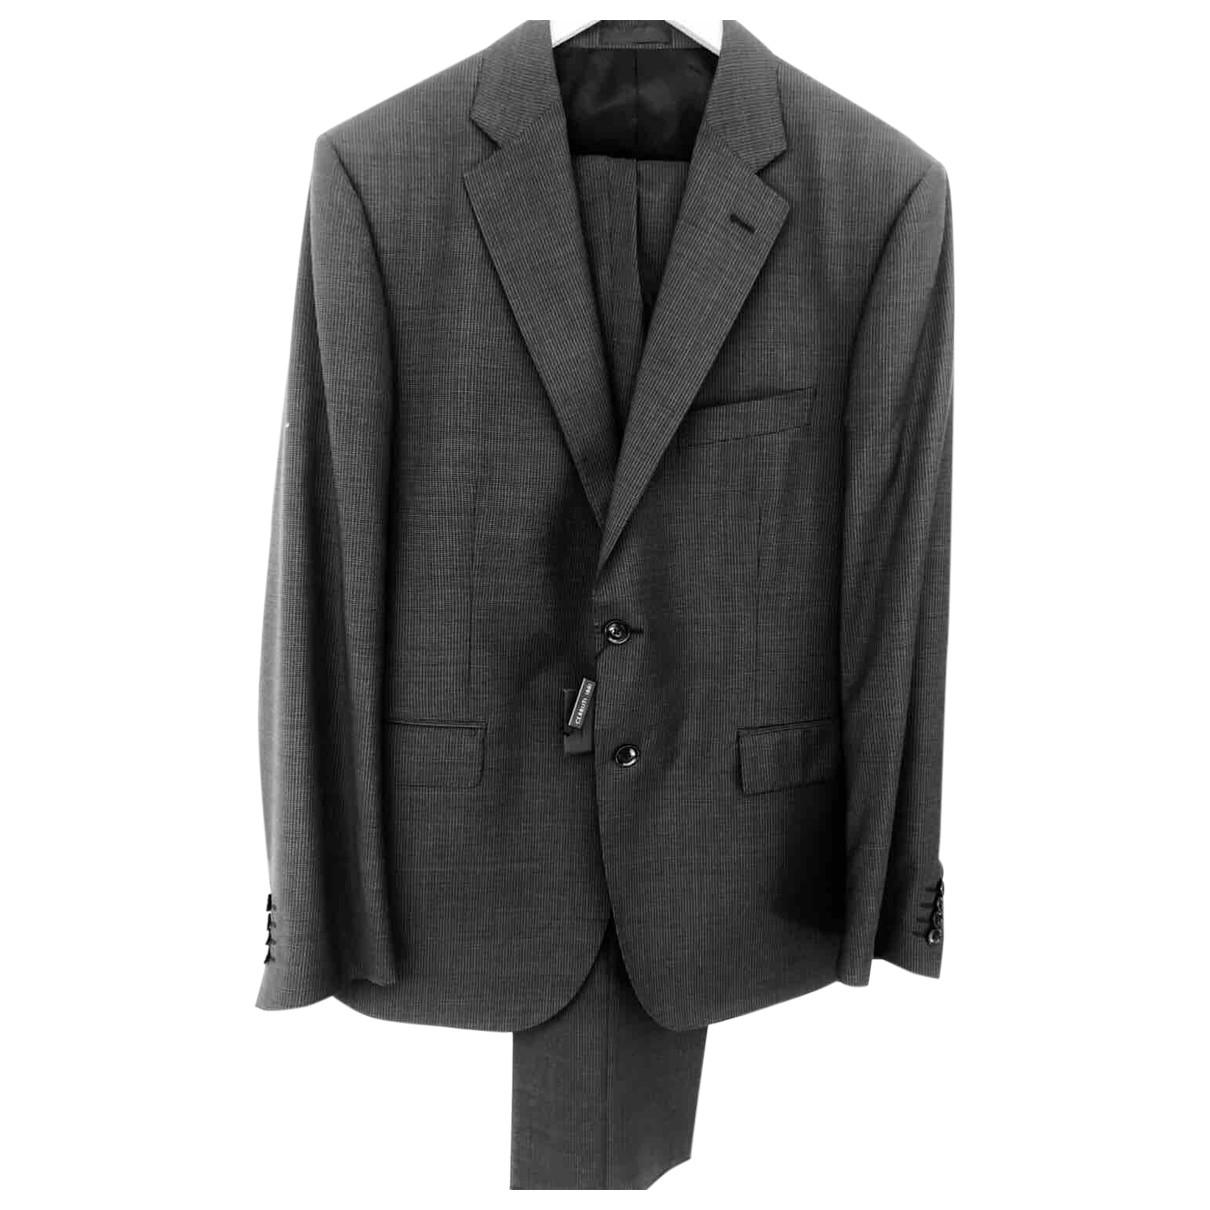 Cerruti \N Anthracite Wool Suits for Men 54 IT